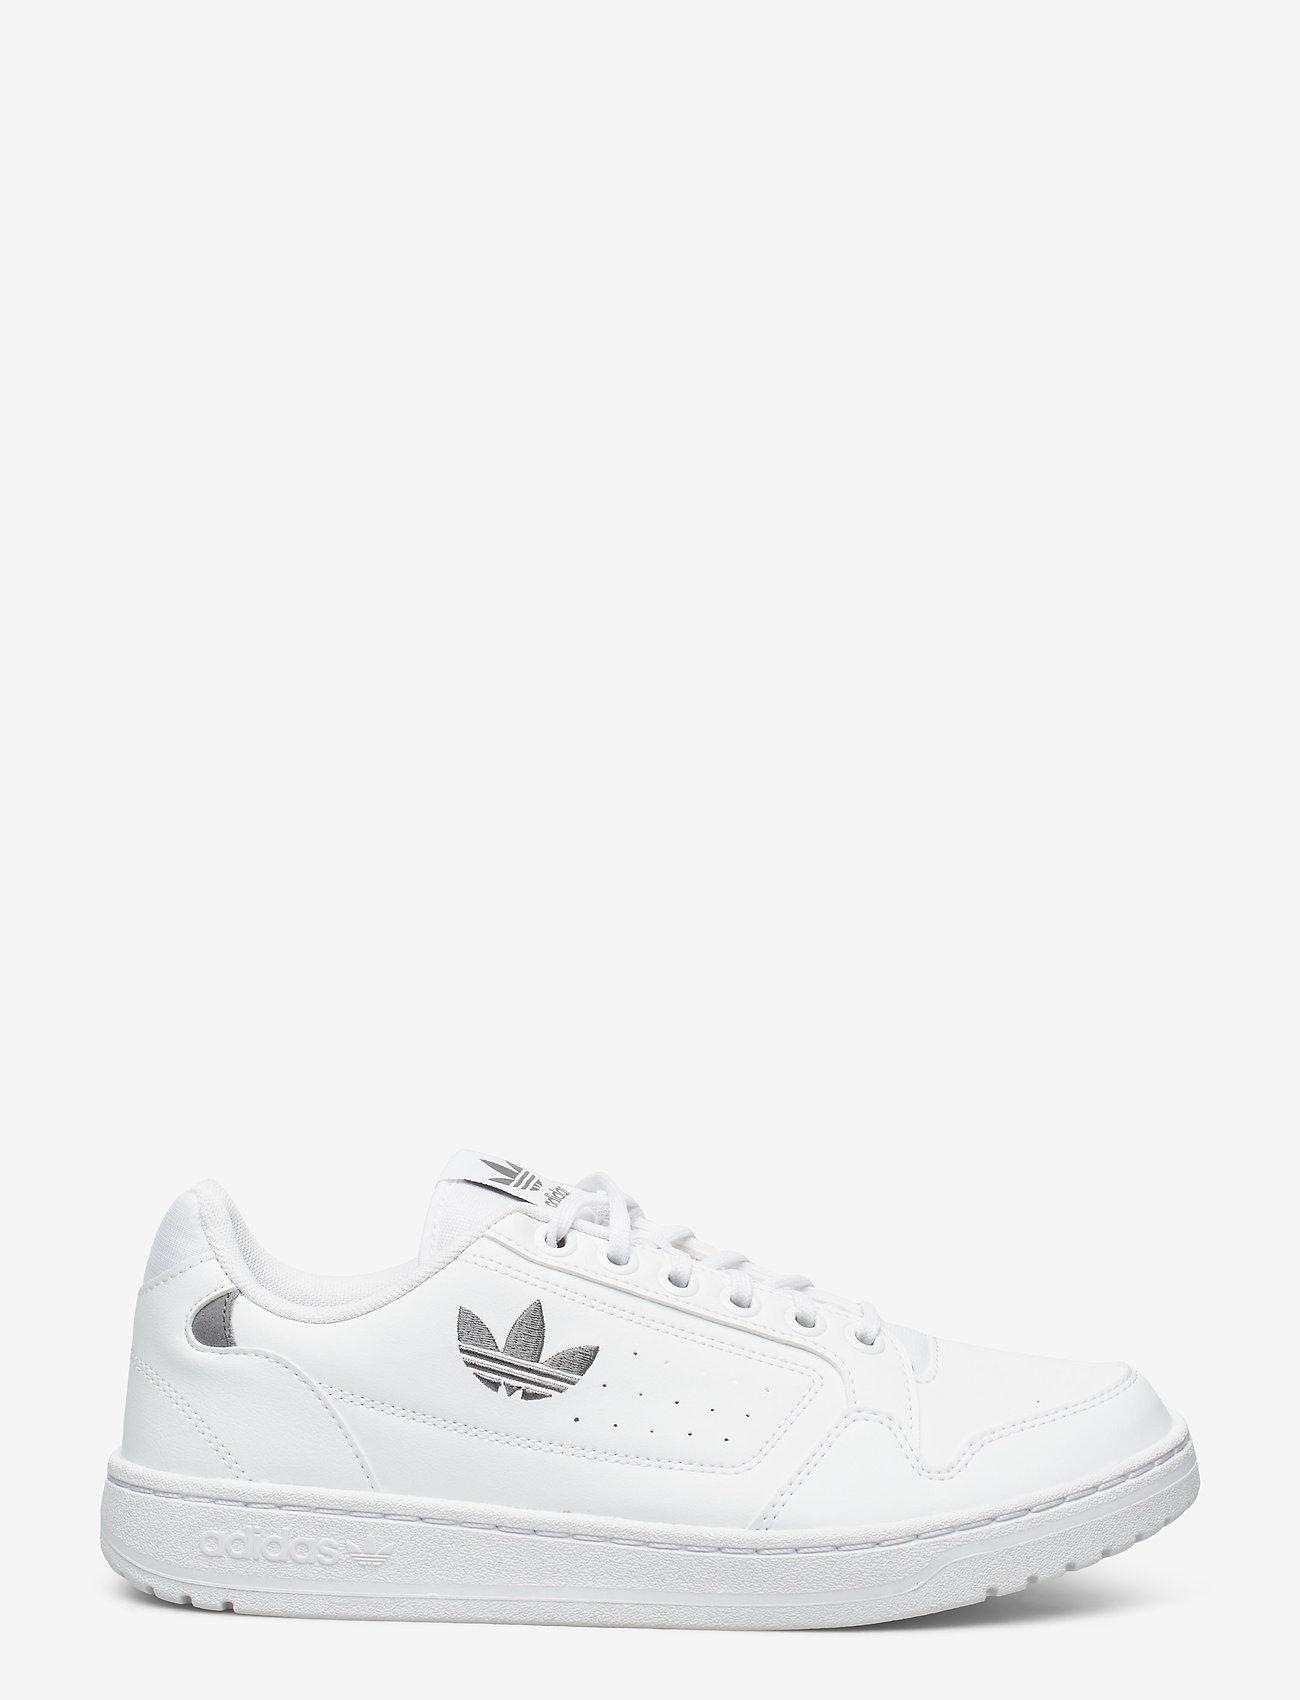 adidas Originals - NY 92 - lav ankel - ftwwht/grethr/ftwwht - 1